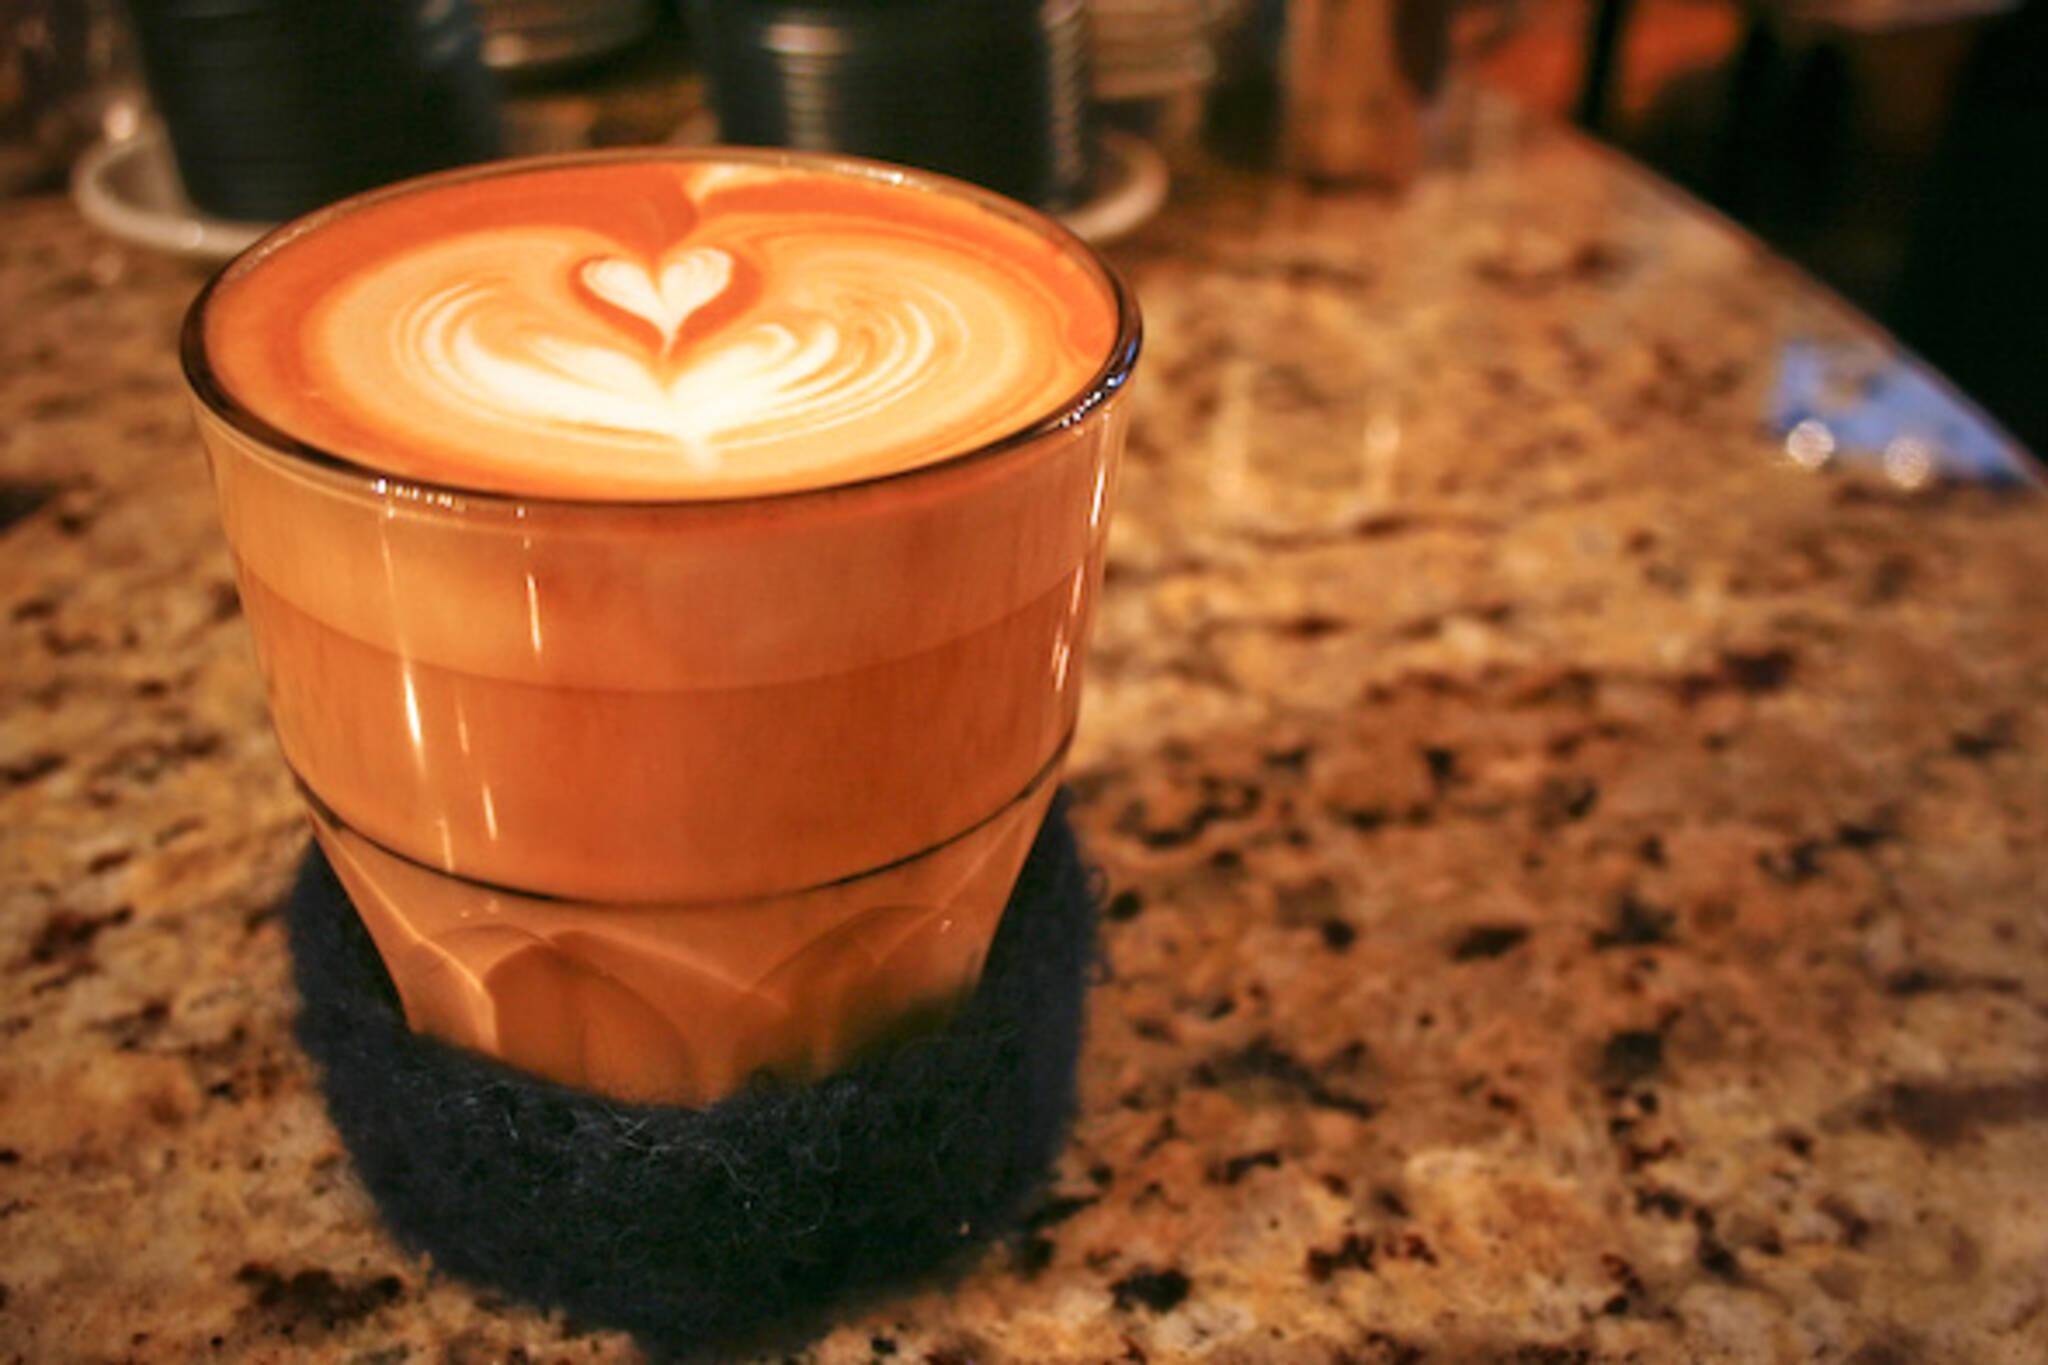 Cafe King and Portland Toronto